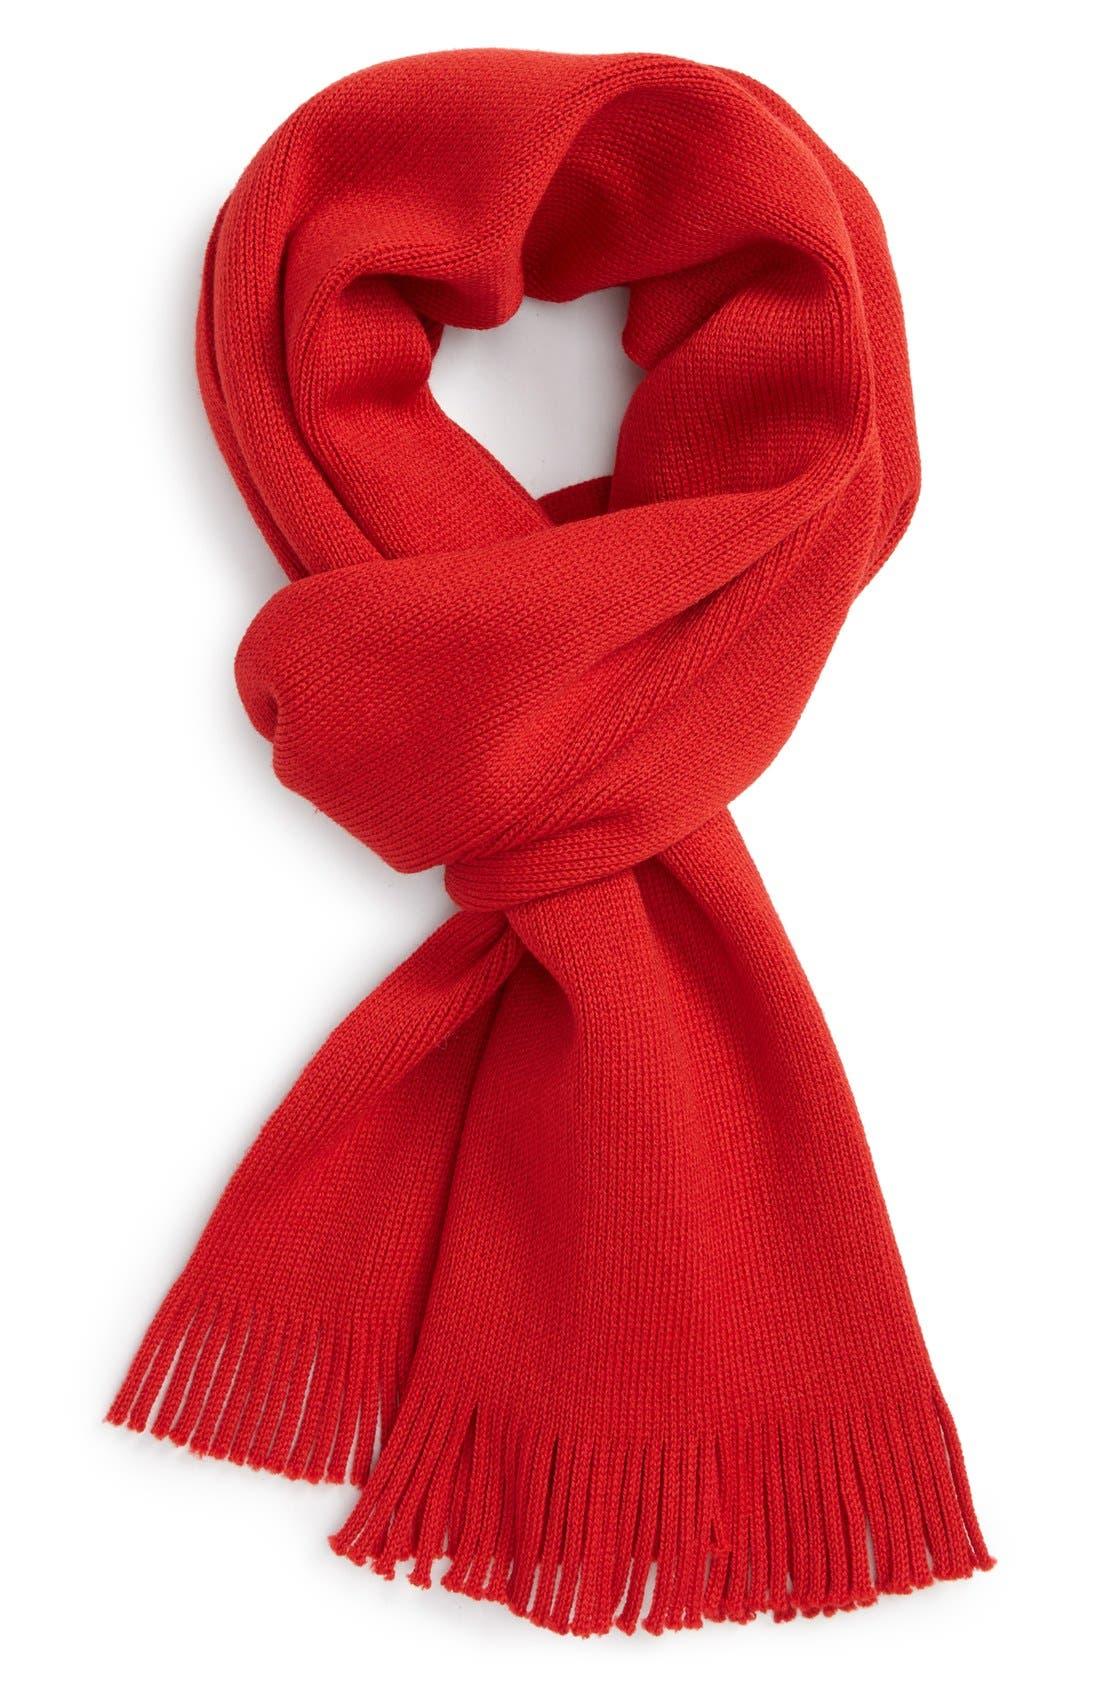 Alternate Image 1 Selected - BOSS HUGO BOSS 'Albas' Wool Scarf